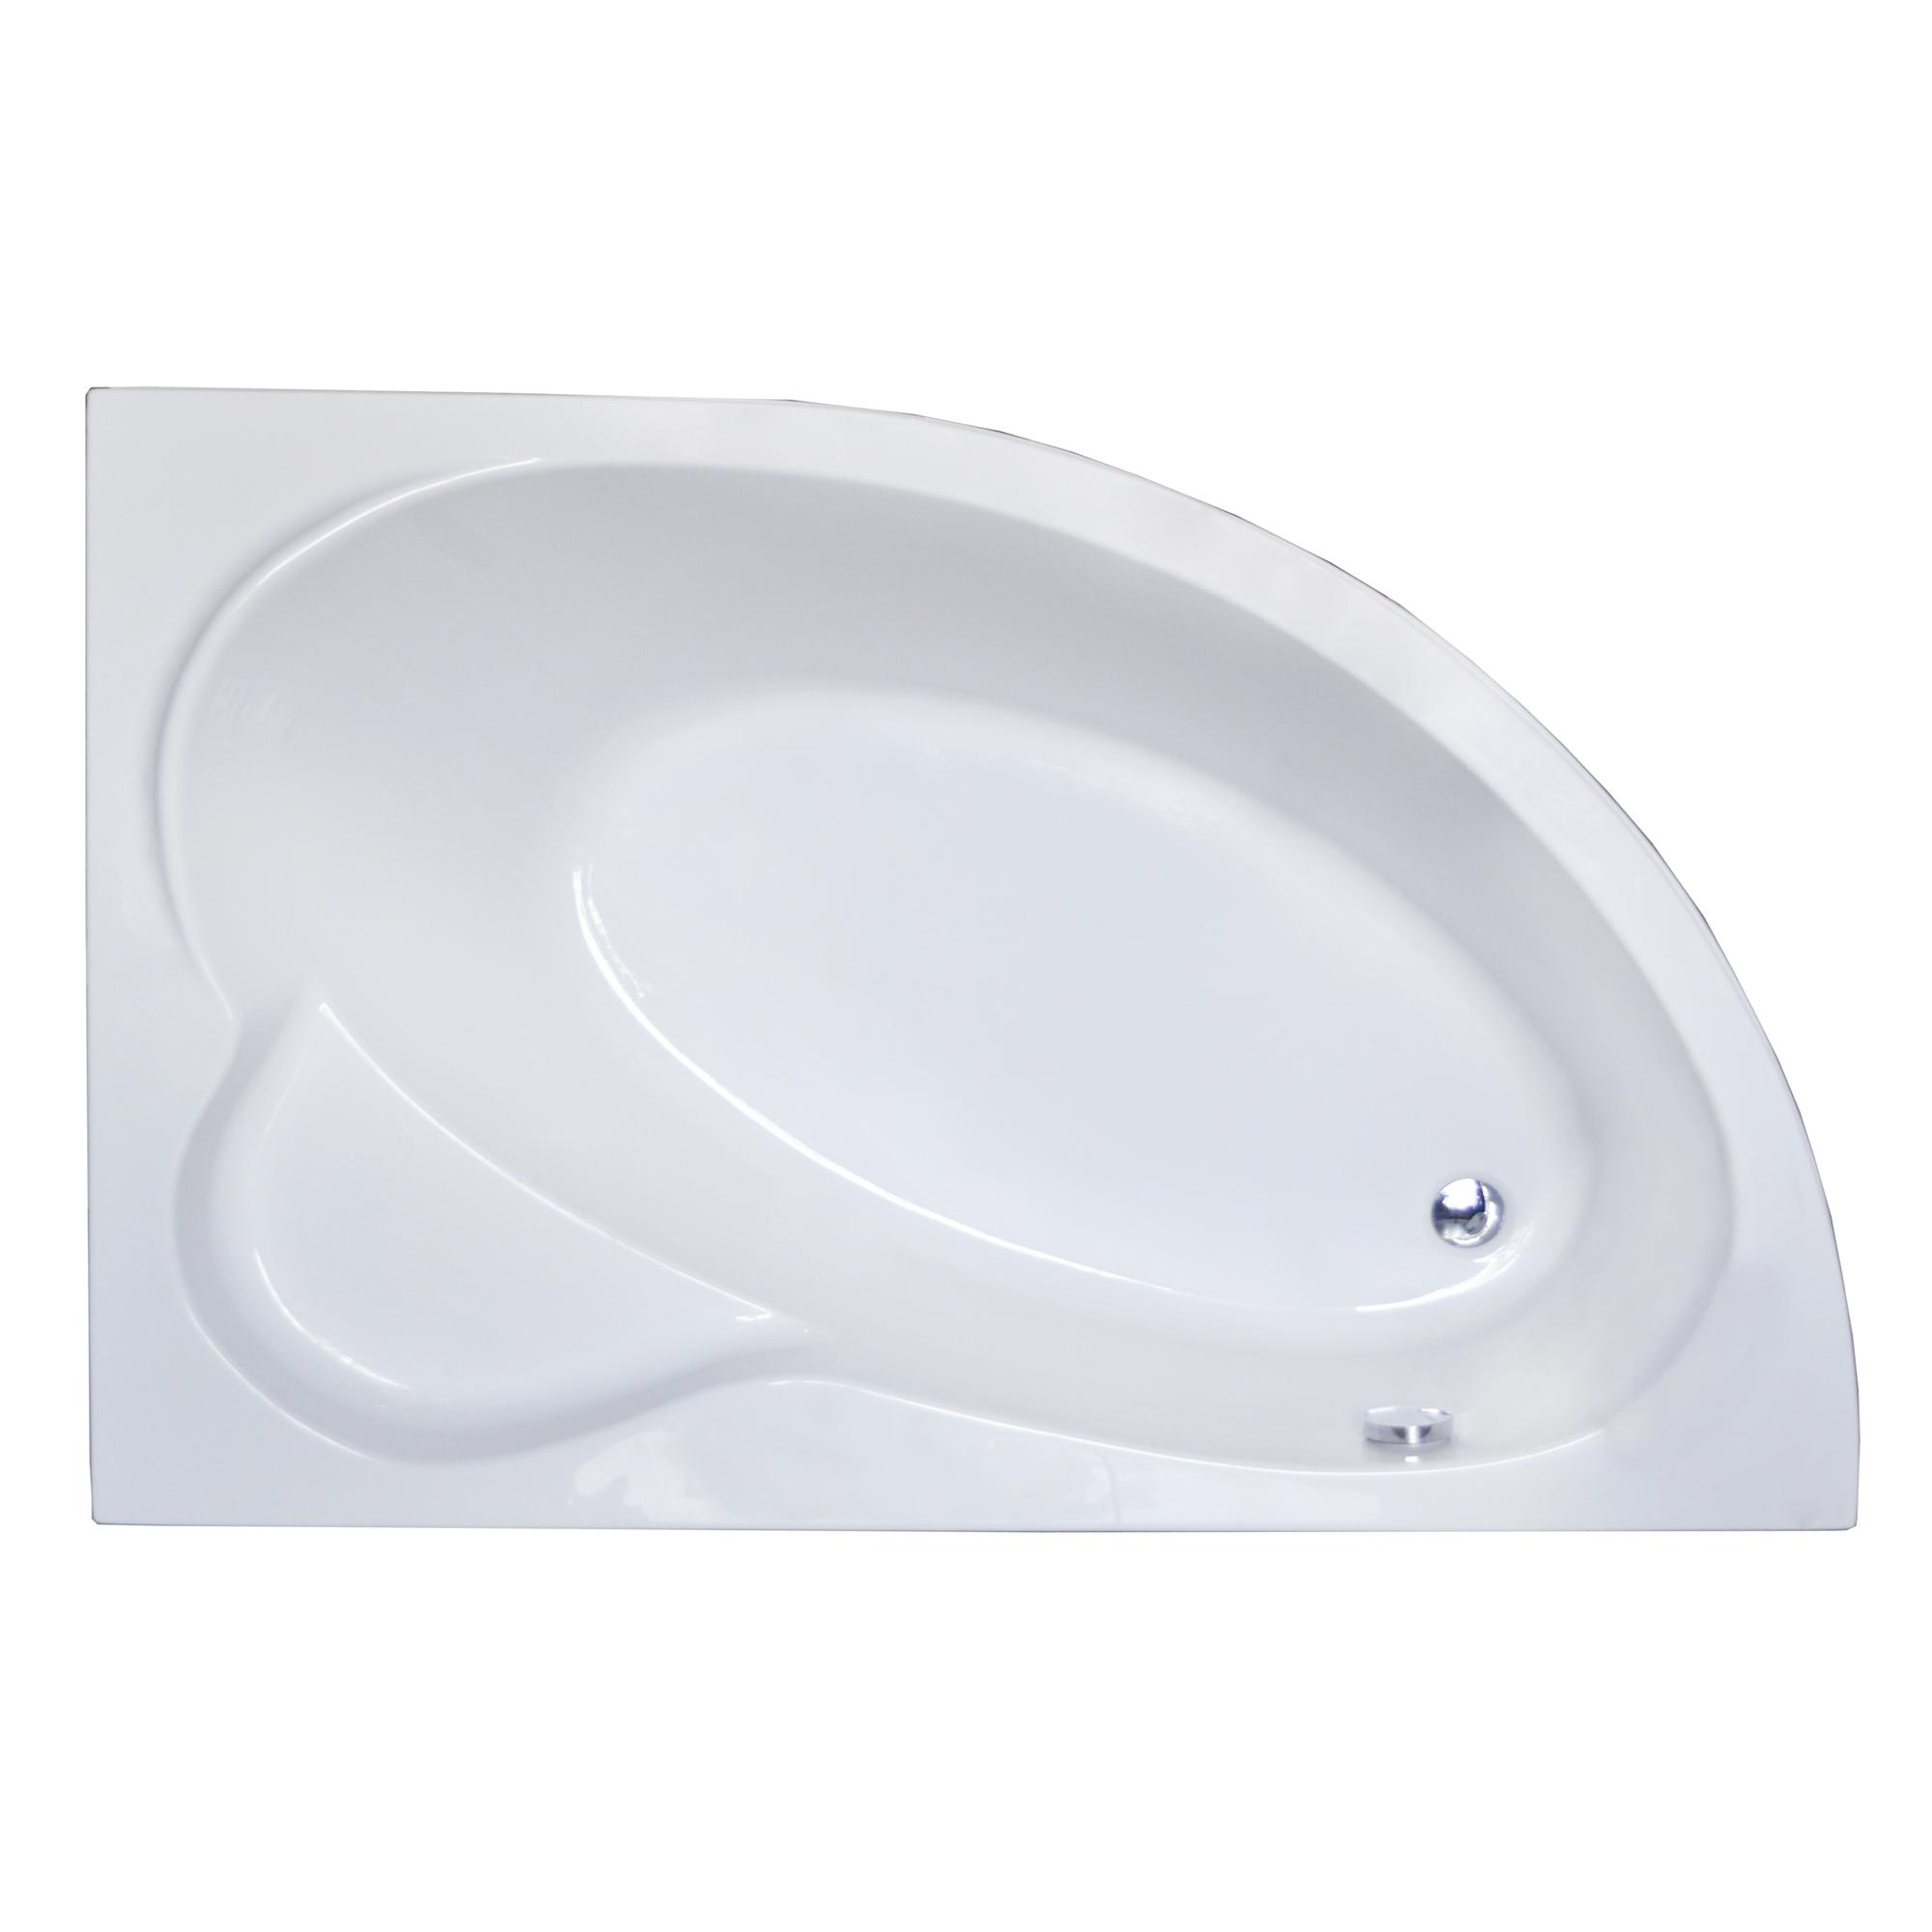 Акриловая ванна Royal bath Alpine RB819101 160х100 R акриловая ванна royal bath alpine rb 819101 правая 160х100 rb819101r